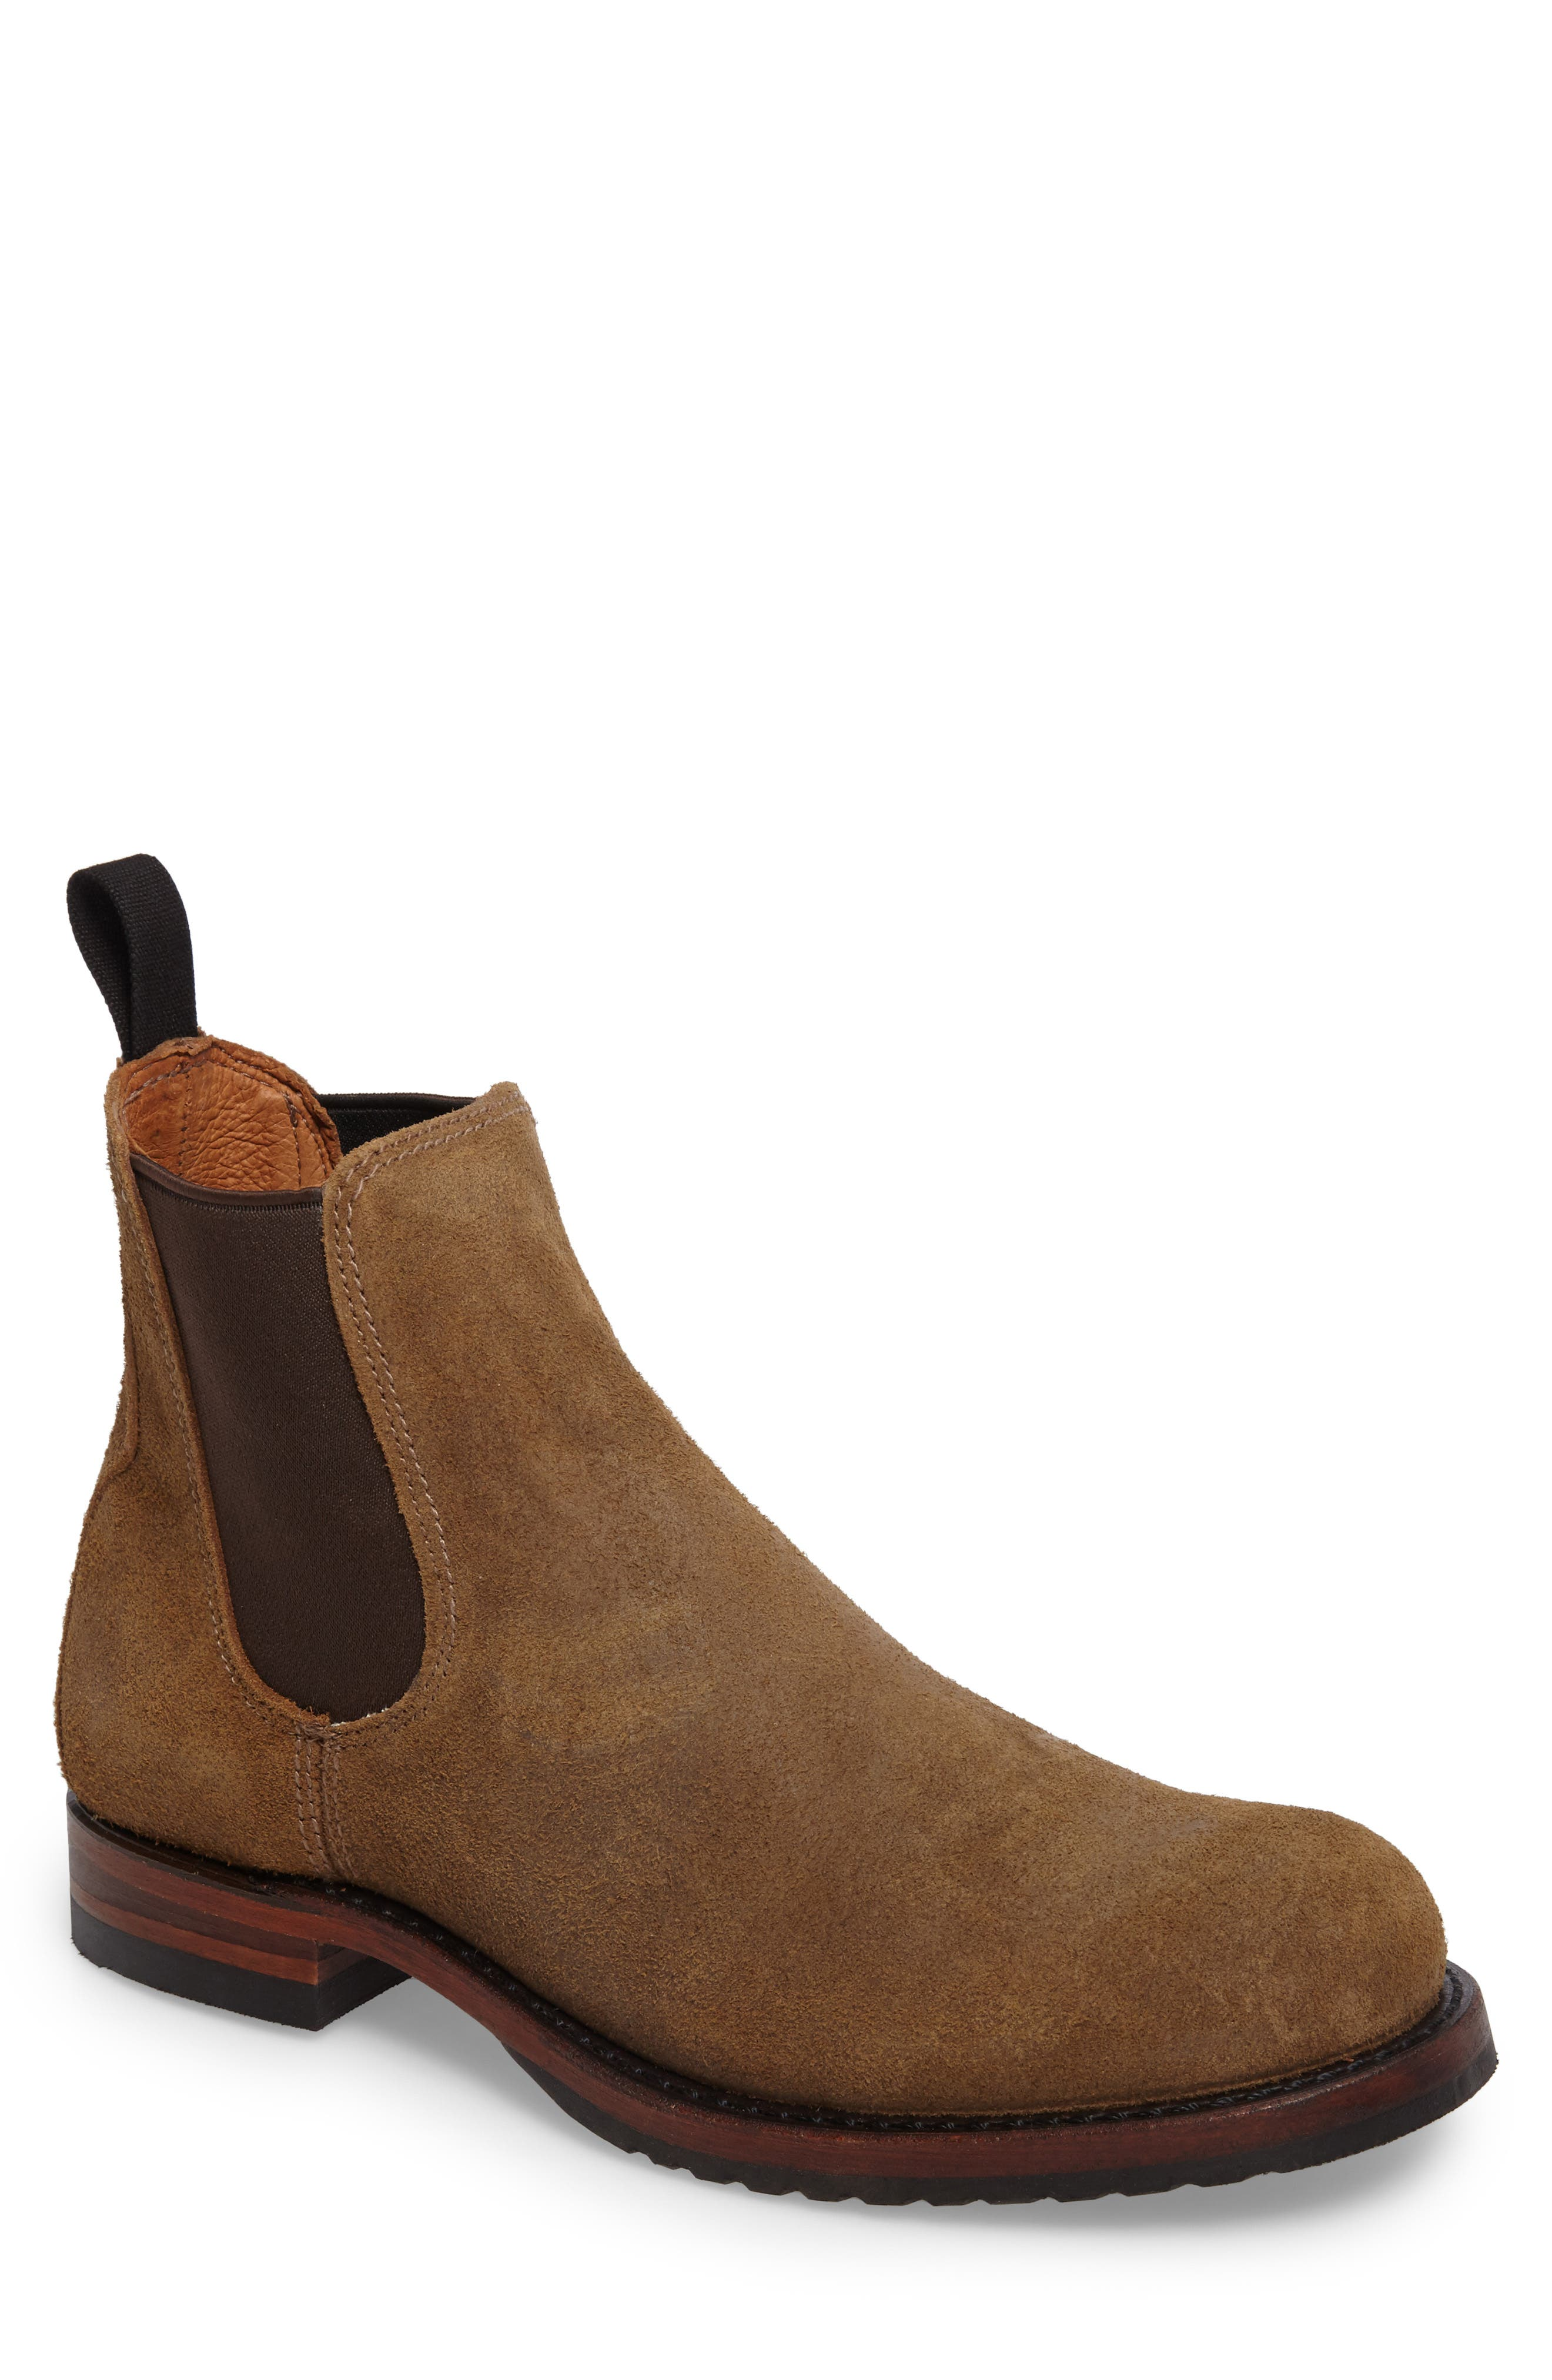 Logan Chelsea Boot,                             Main thumbnail 1, color,                             215